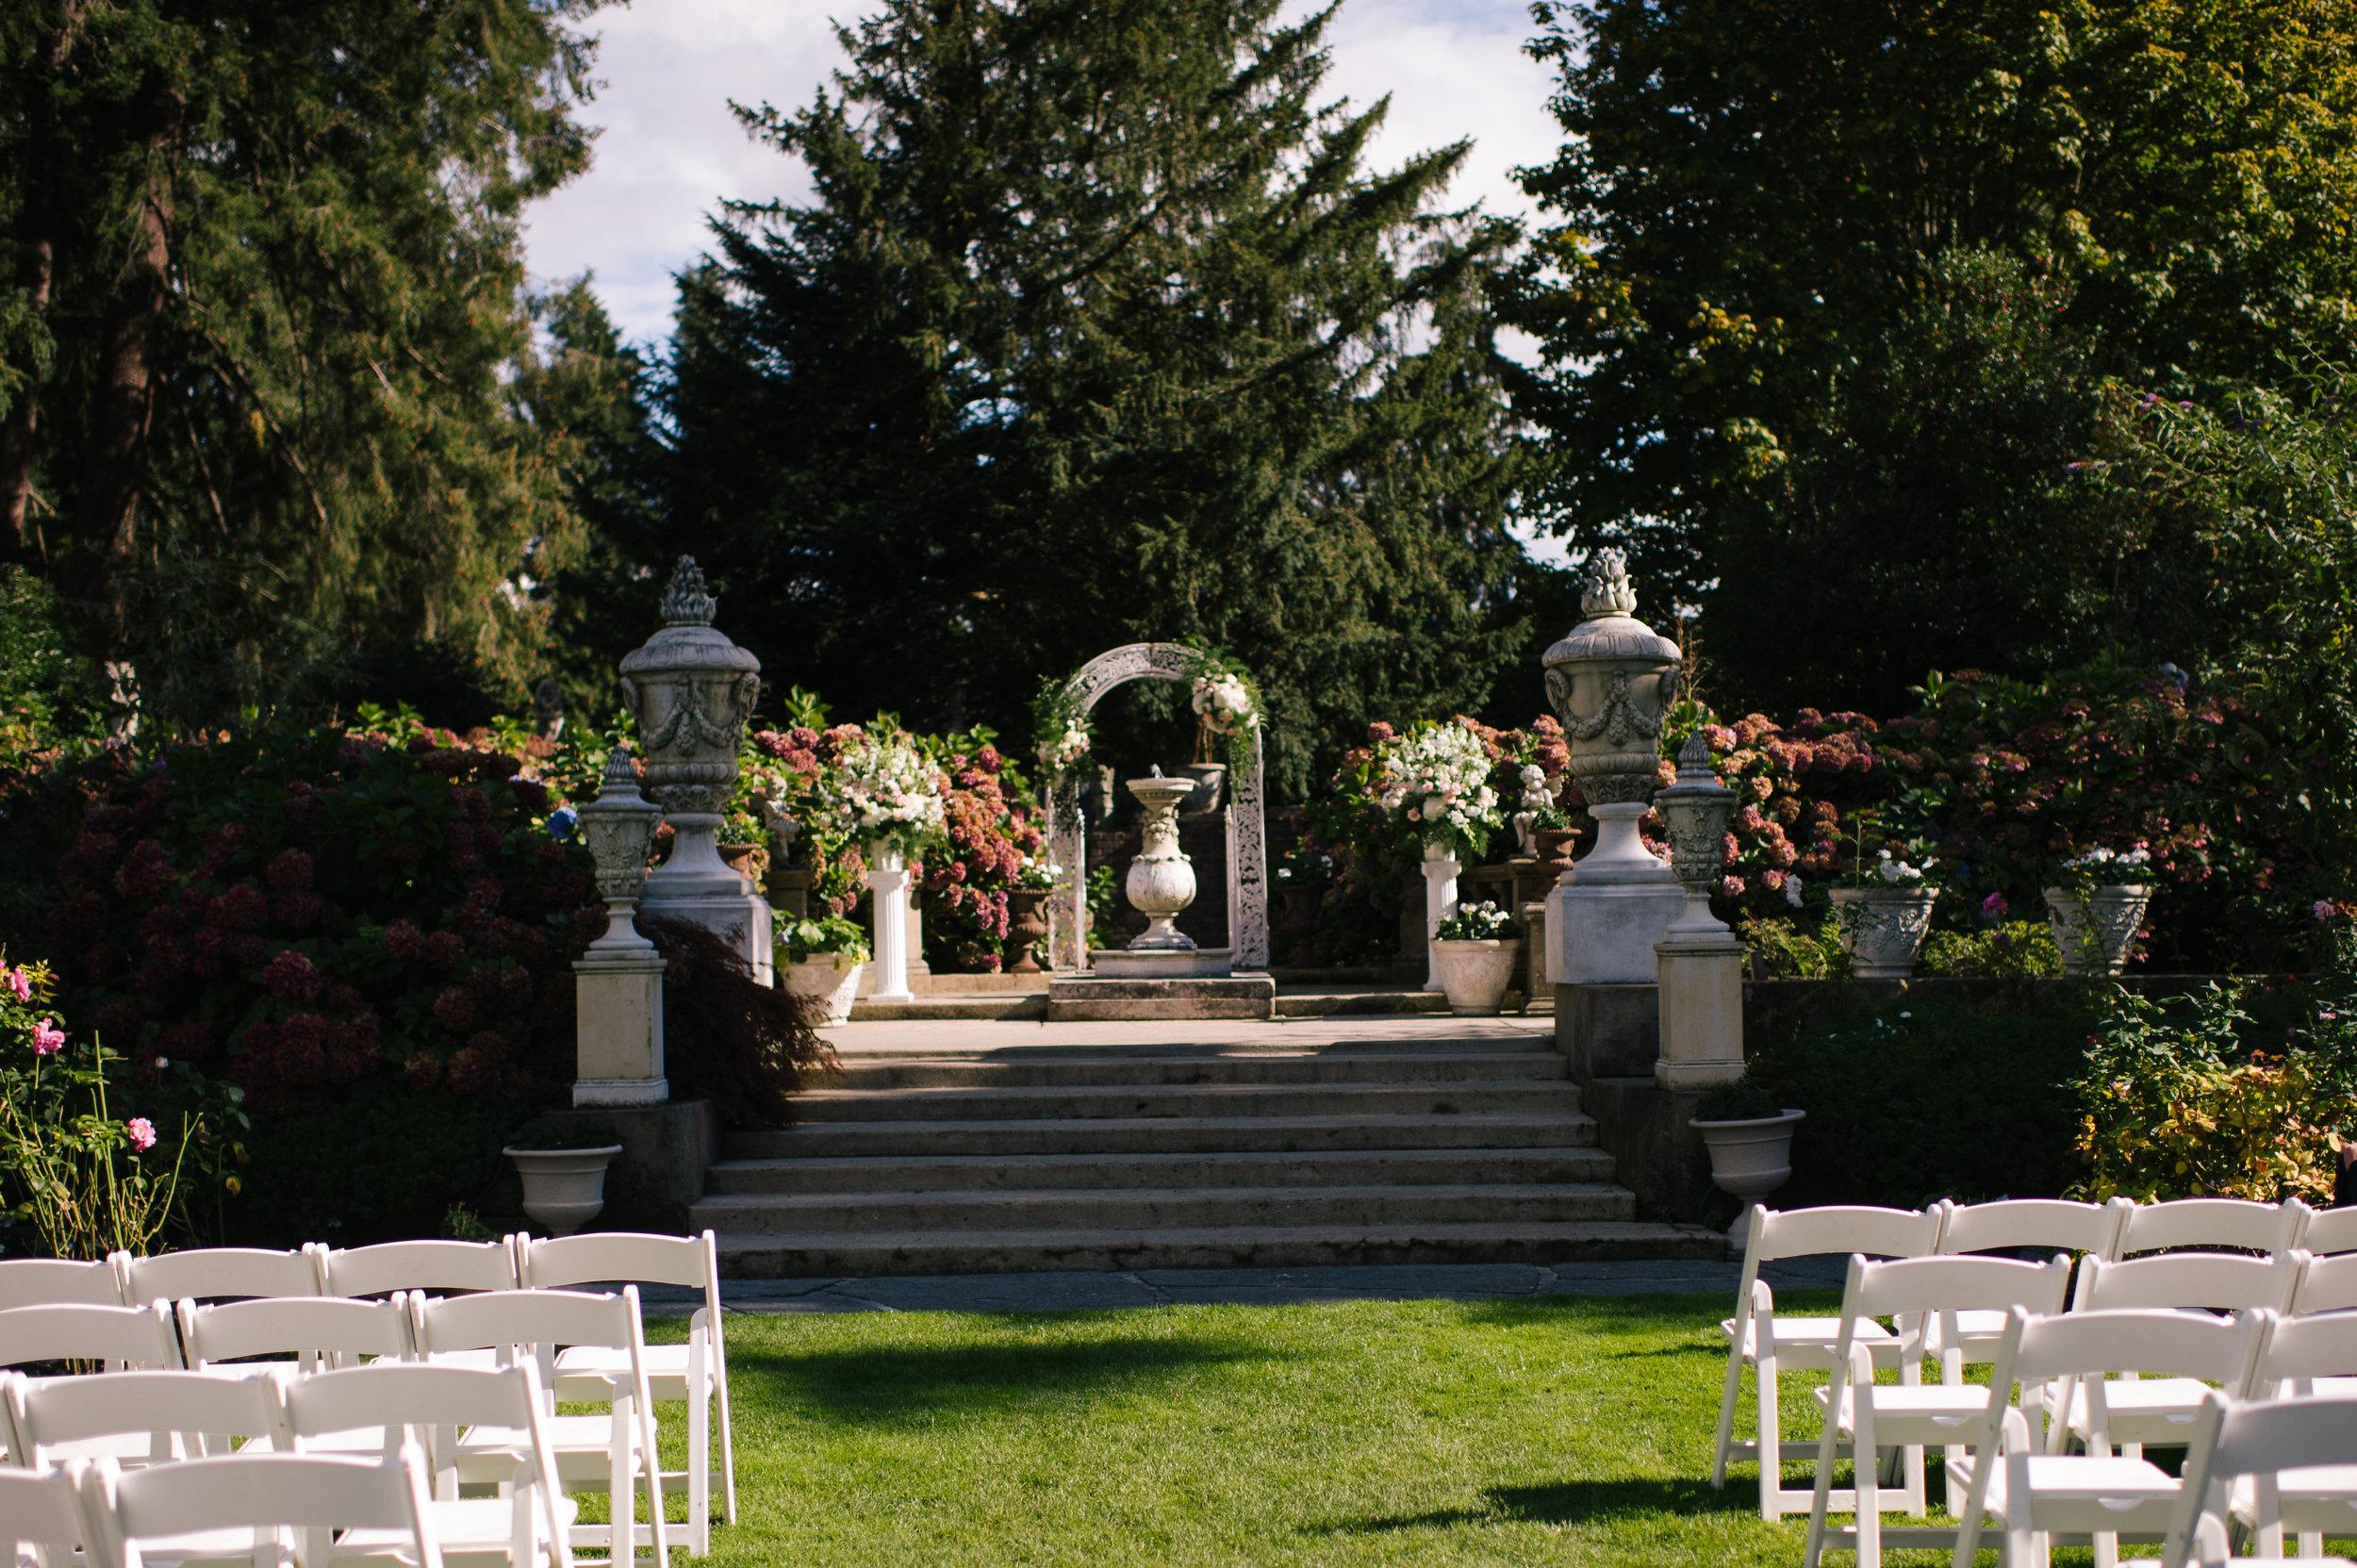 kellylemonphotography_lucy+kento_wedding-190.jpg